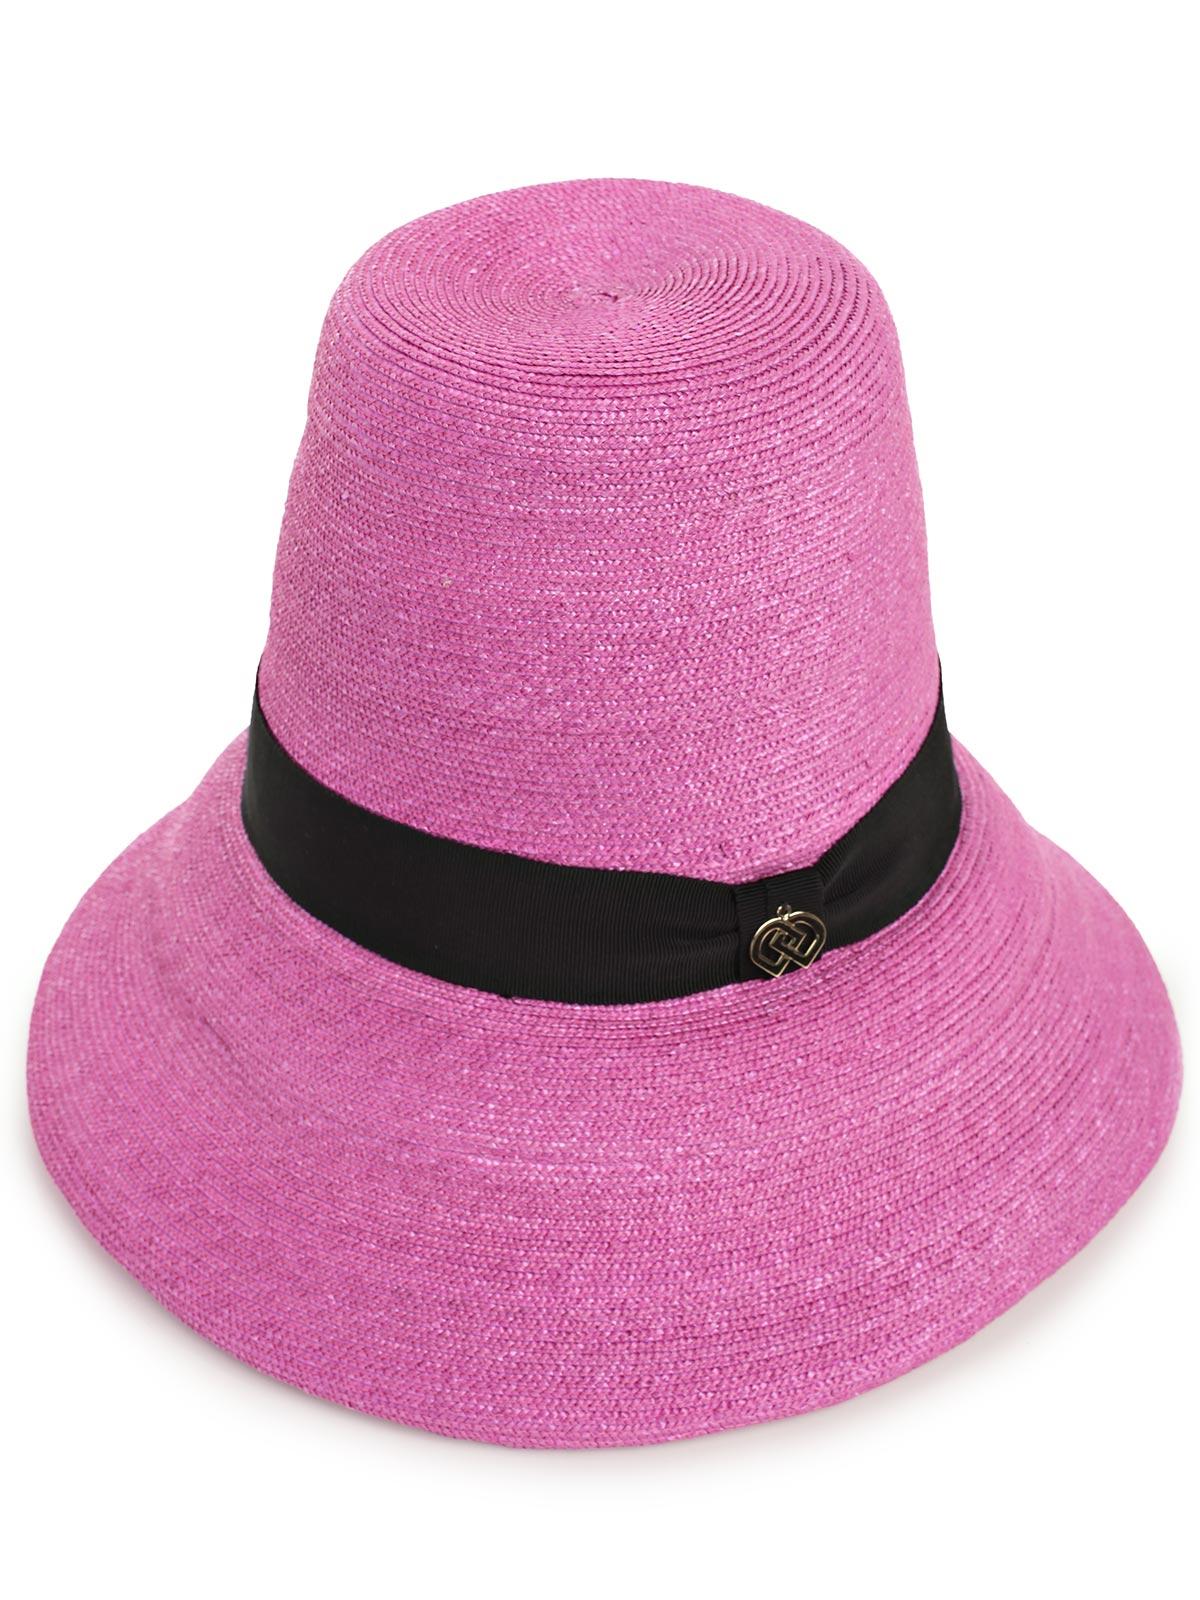 Picture of DSQUARED2 HAT CAPPELLO AUDREY